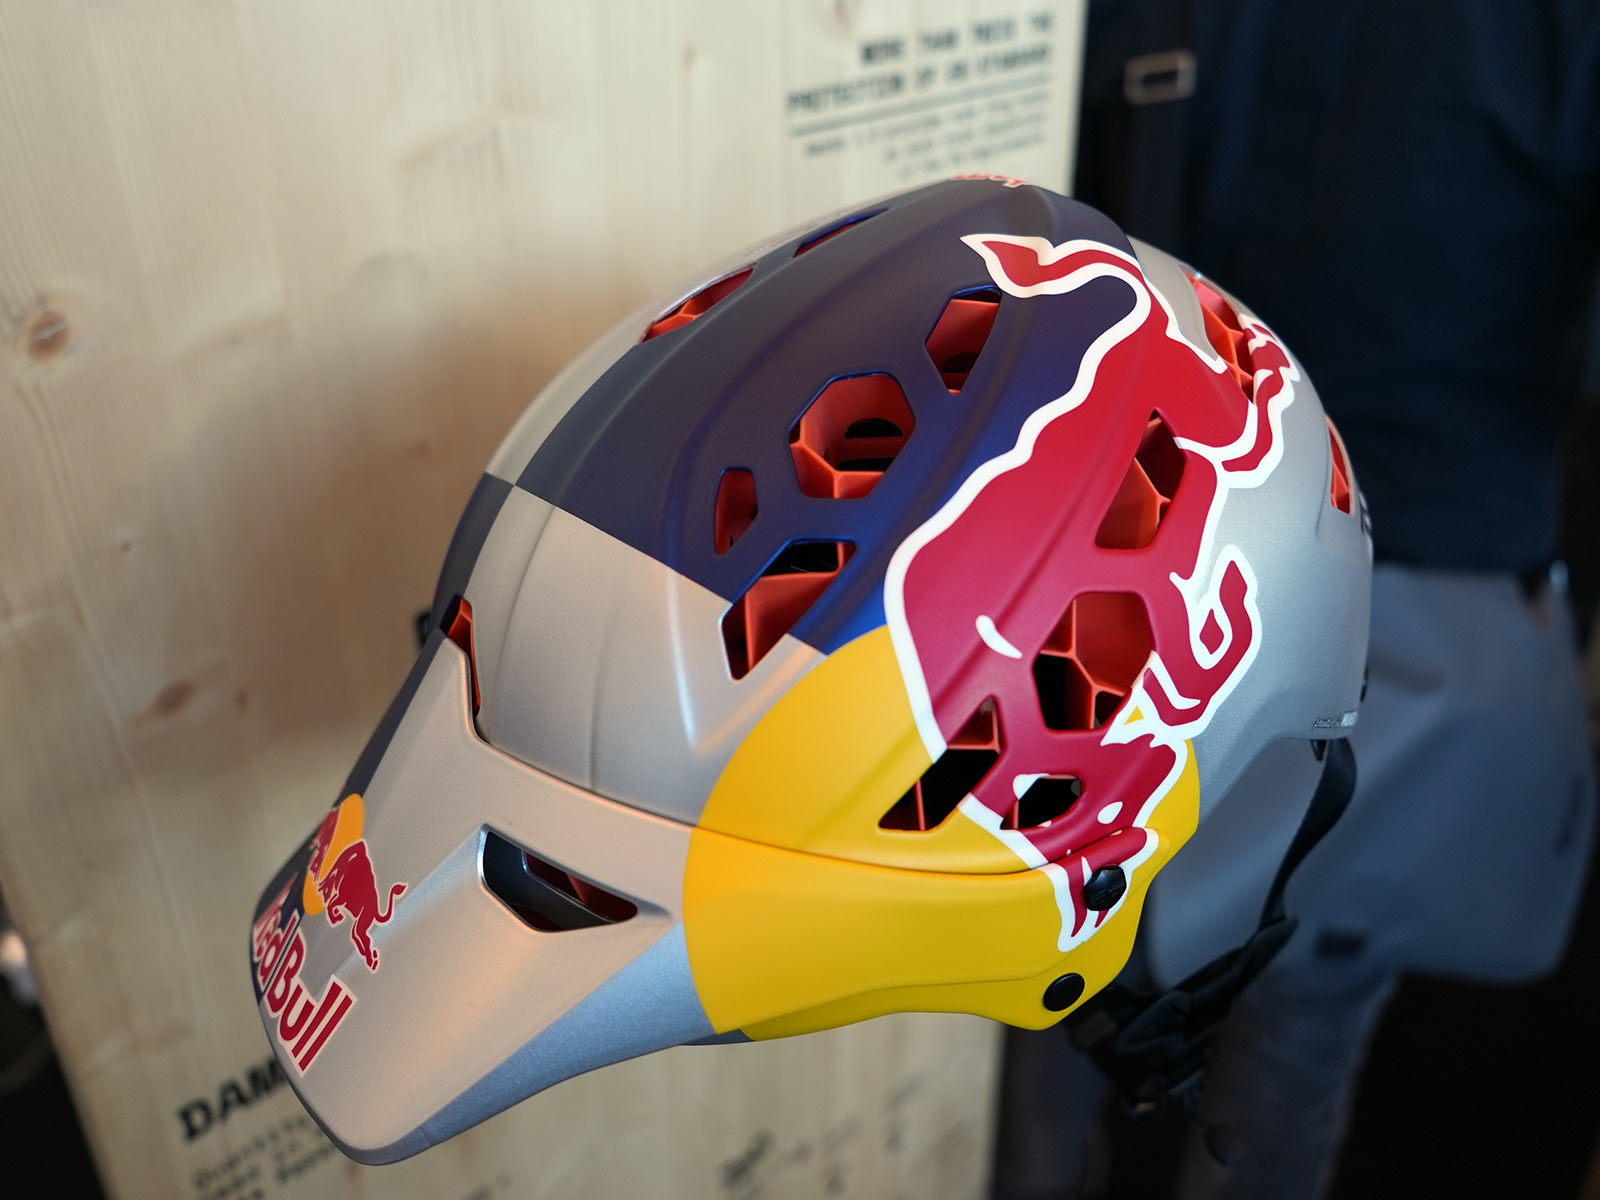 720 protection hex air mountain bike helmet with red bull logo branding